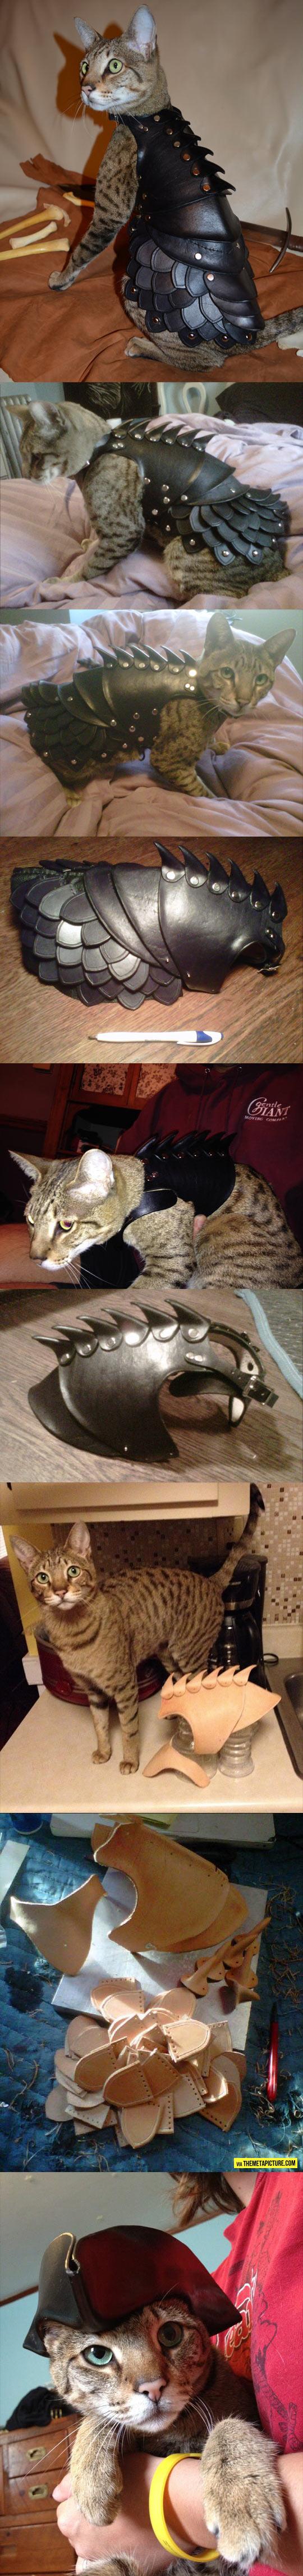 Kitty Leather Armor